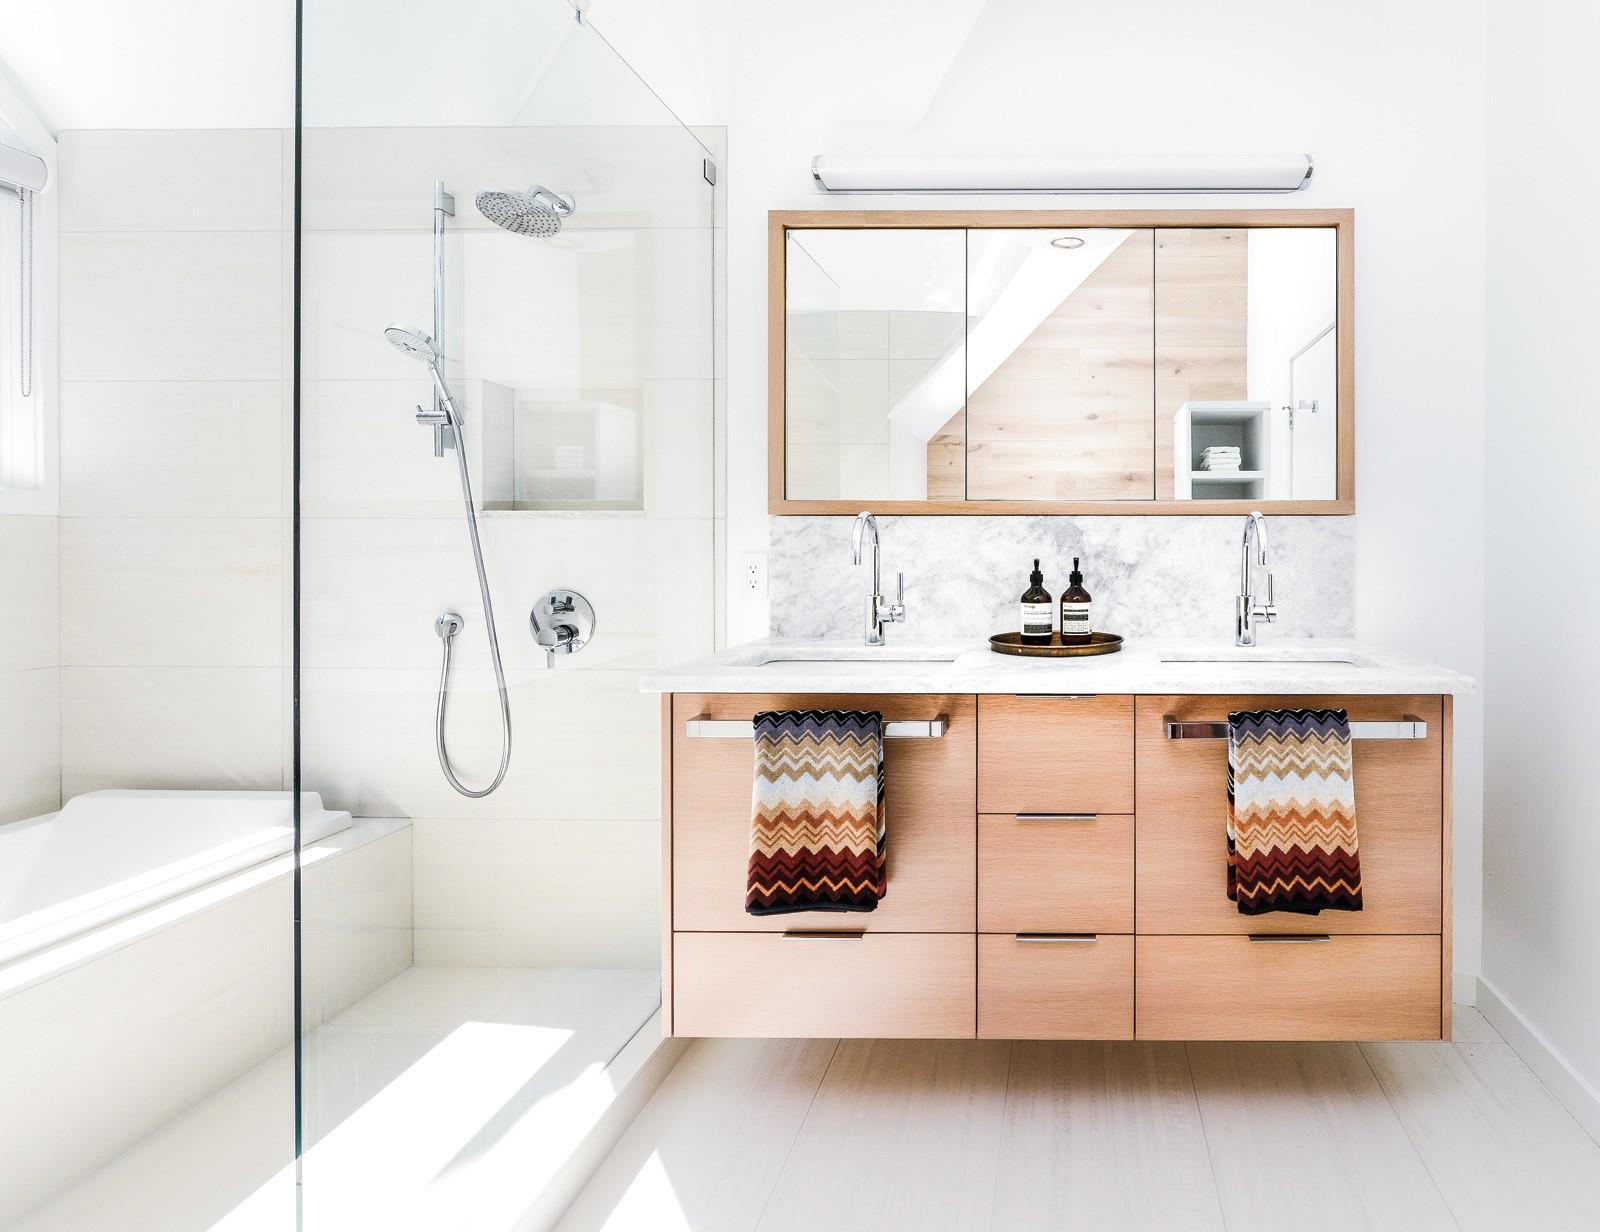 Cozy Scandinavian Bathroom Design   Art Home Design Ideas